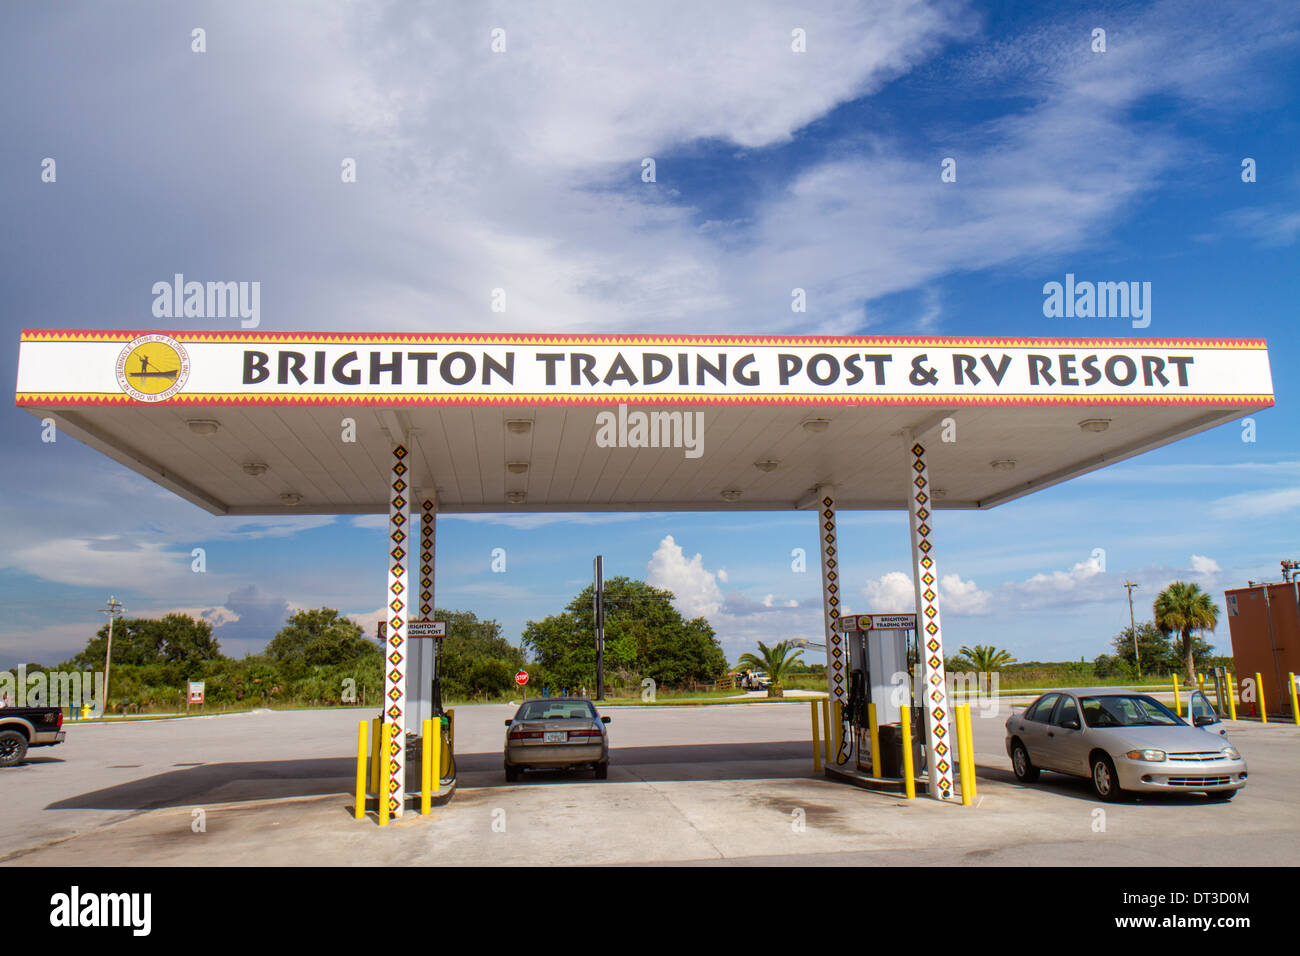 Florida Okeechobee Seminole Tribe Brighton Indian Reservation Native American Trading Post & RV Resort gas station petrol gasol - Stock Image